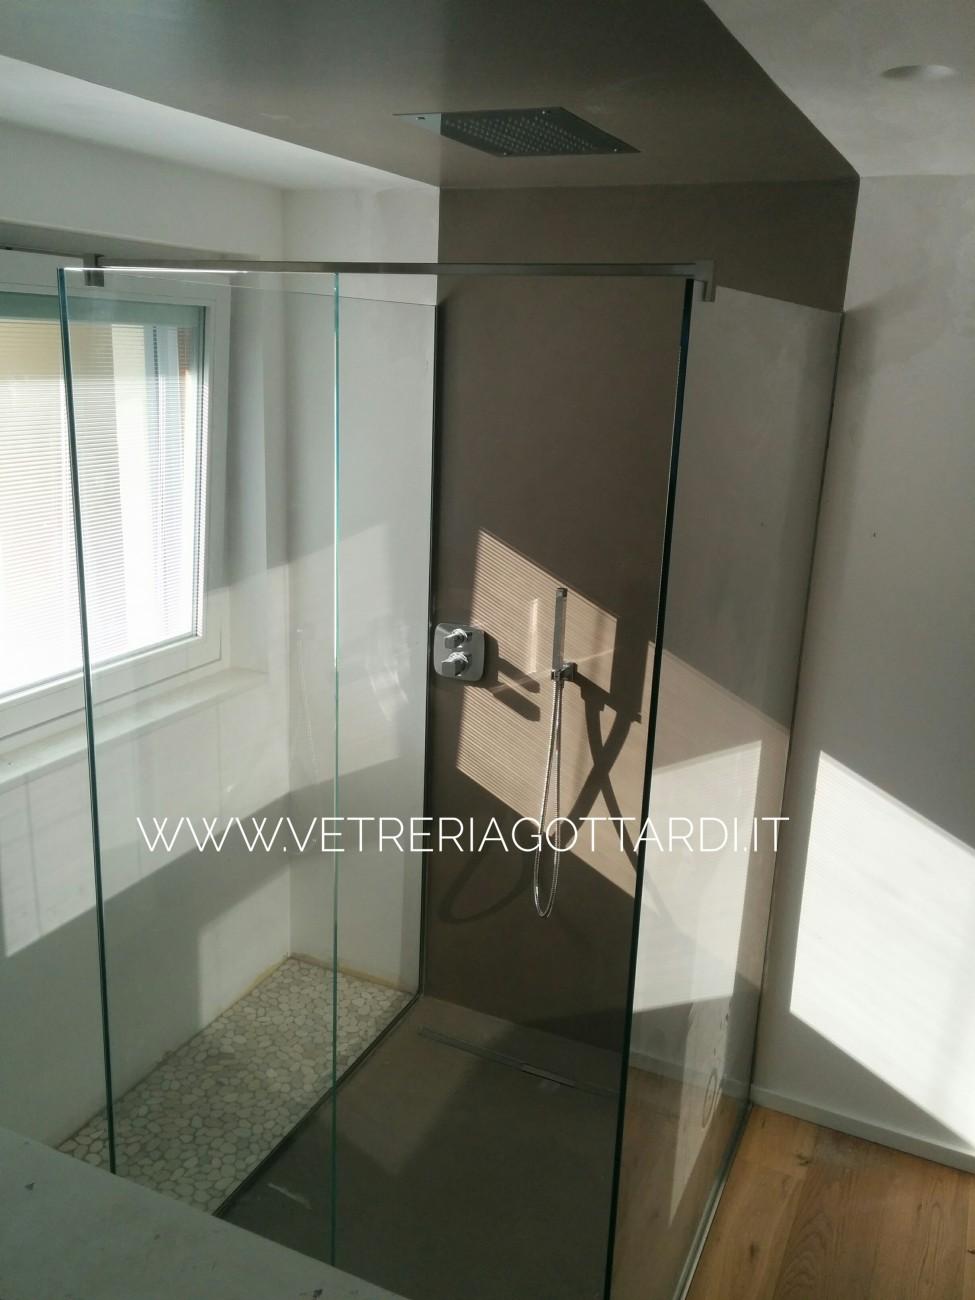 vetreria gottardi, gottardi pergine, doccia, vetro, doccia in vetro, docce, doccia trasparente, doccia ad anta, vetro, walk in